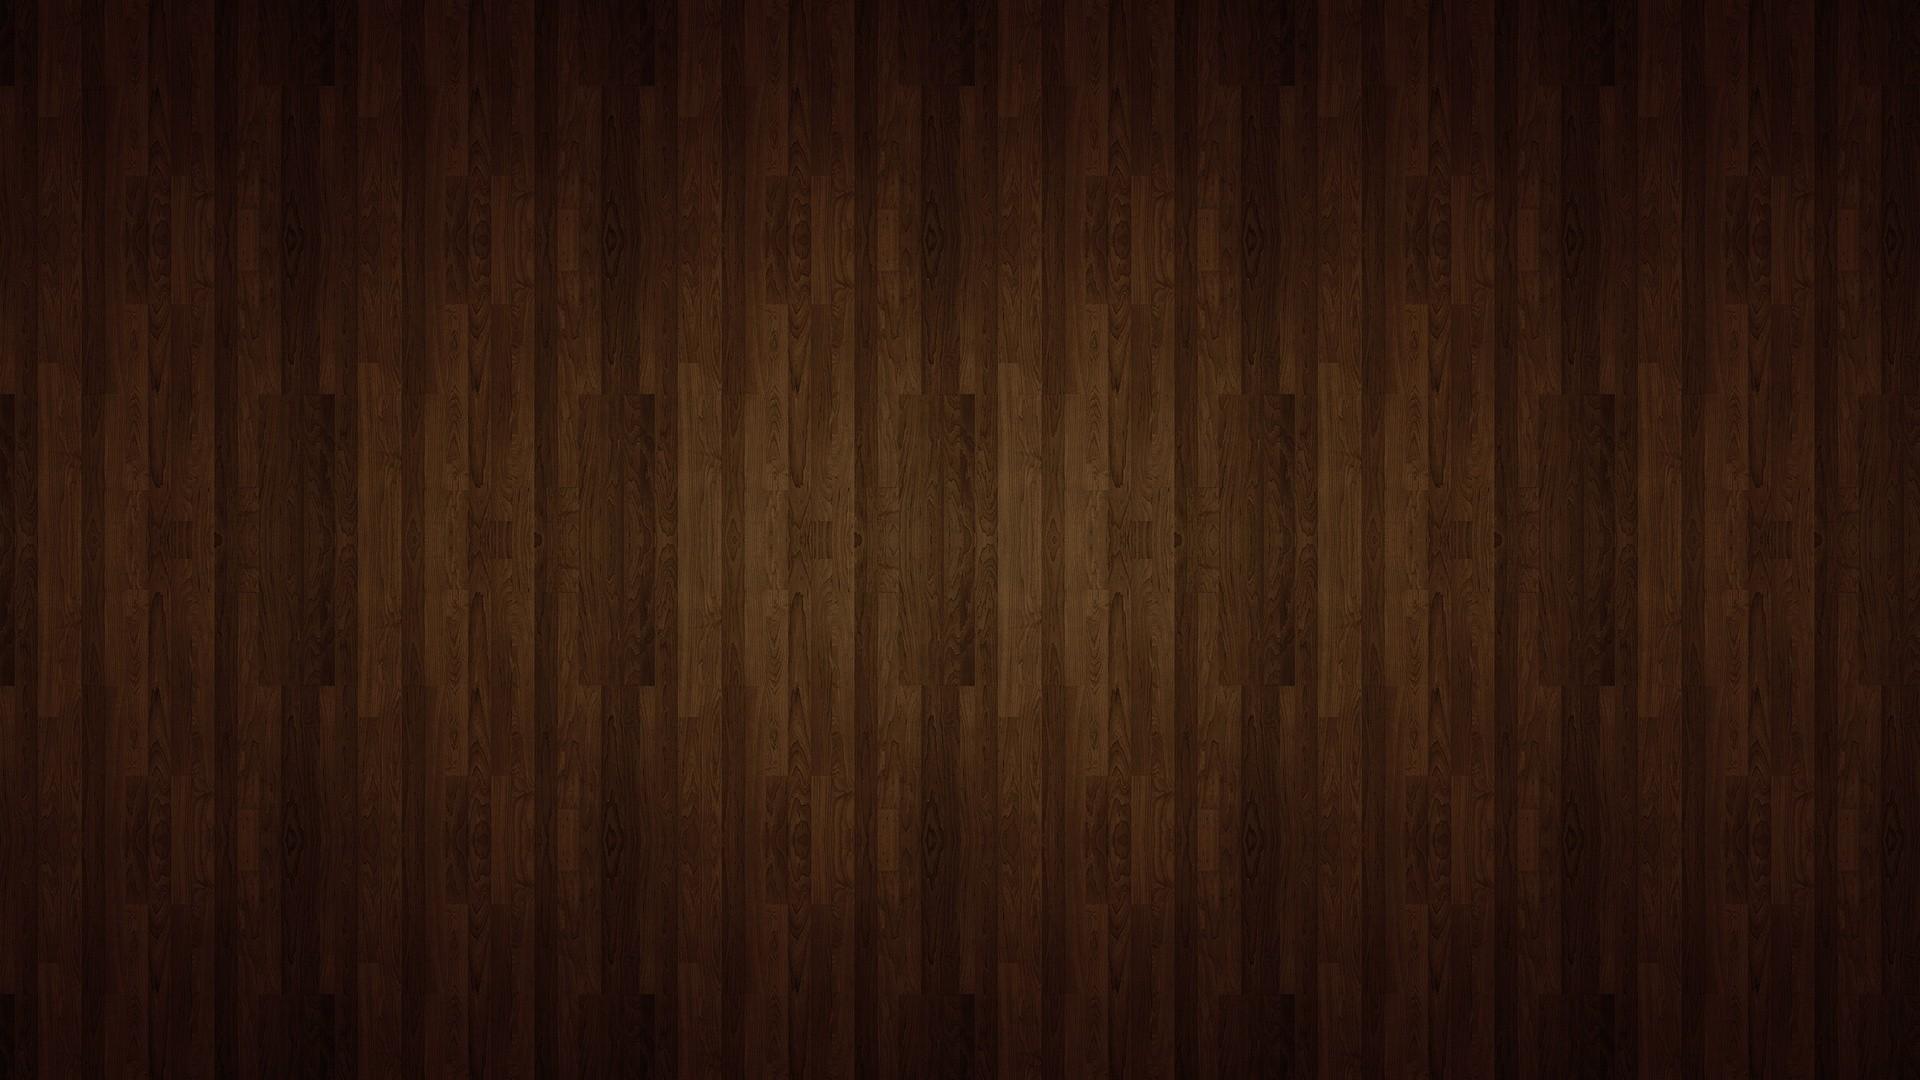 Shiplap HD Wallpaper